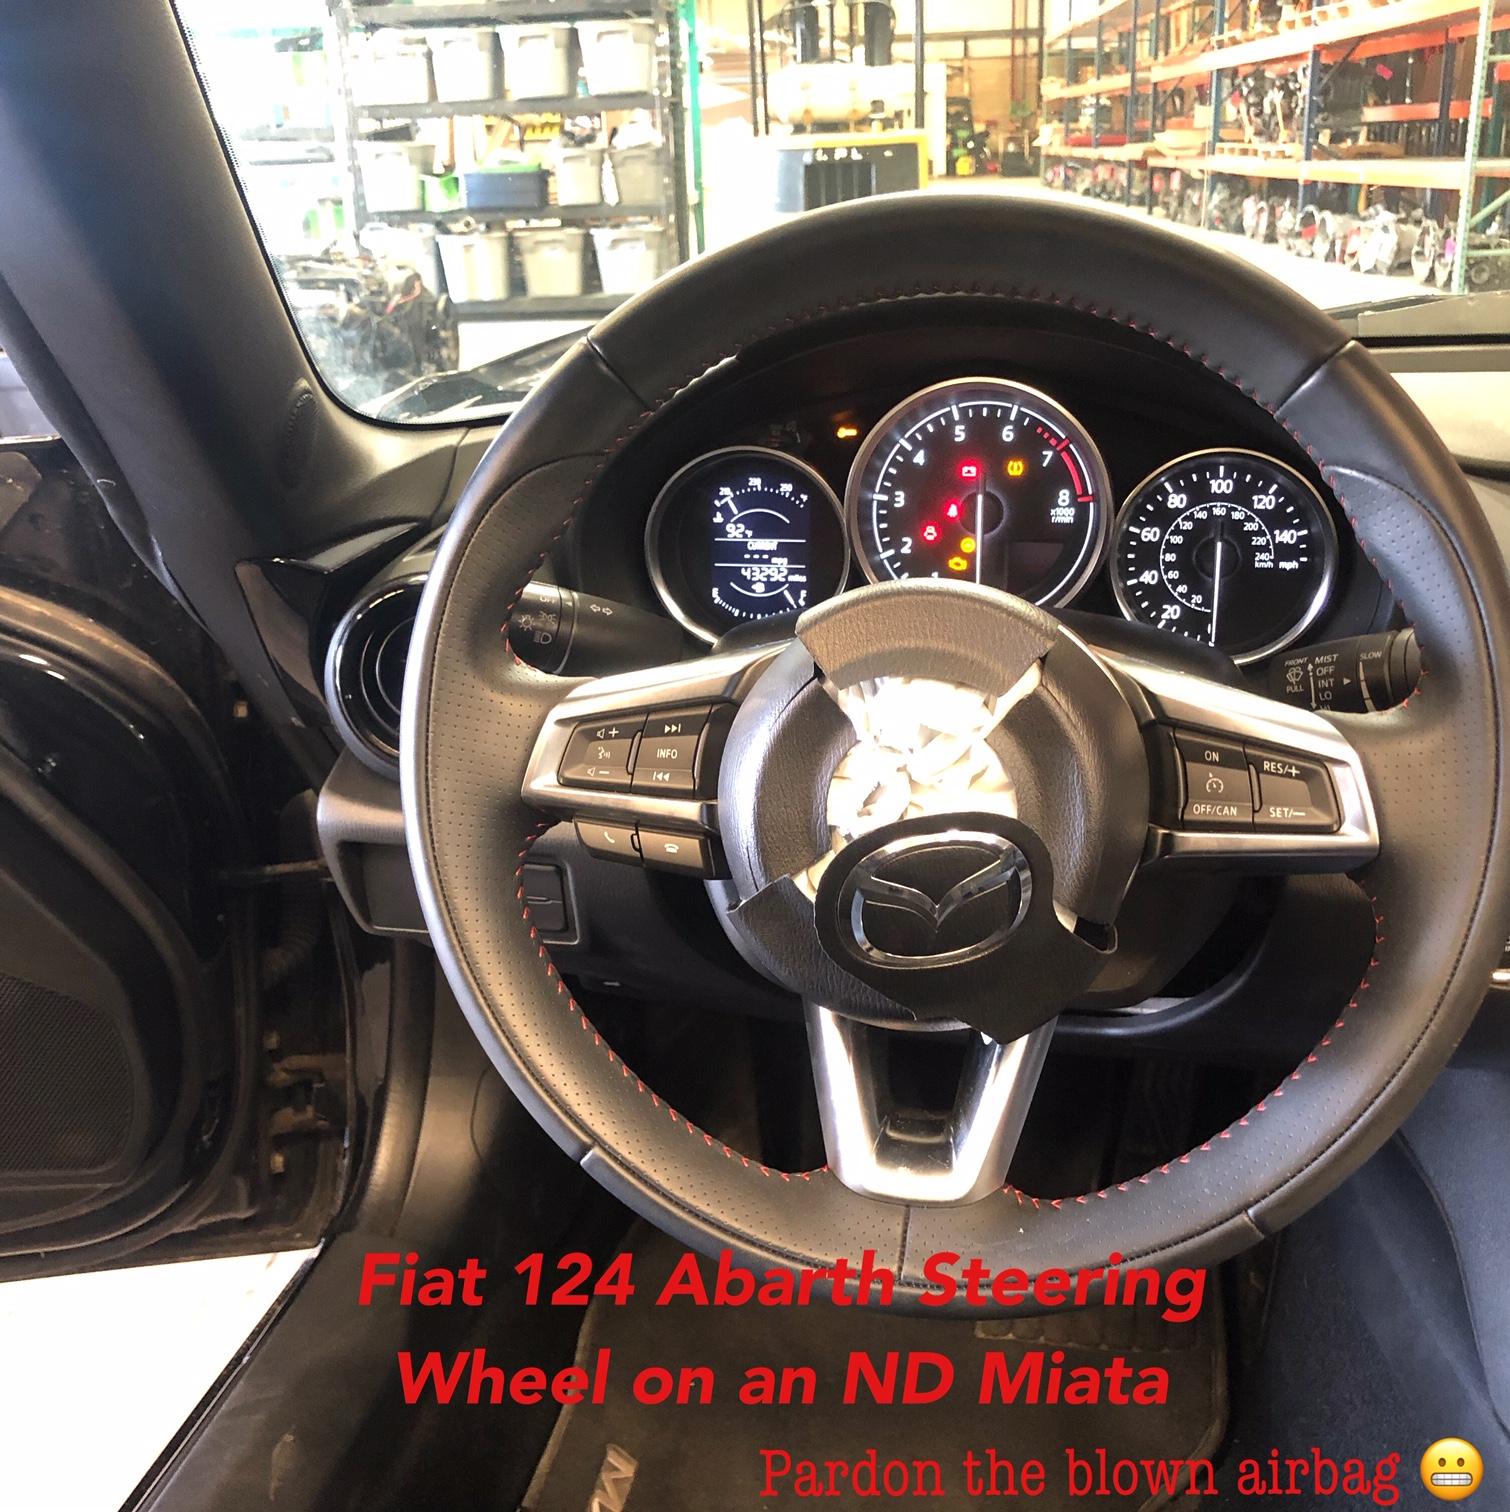 Fiat 124 Spider to ND Miata Compatibility / Interchange